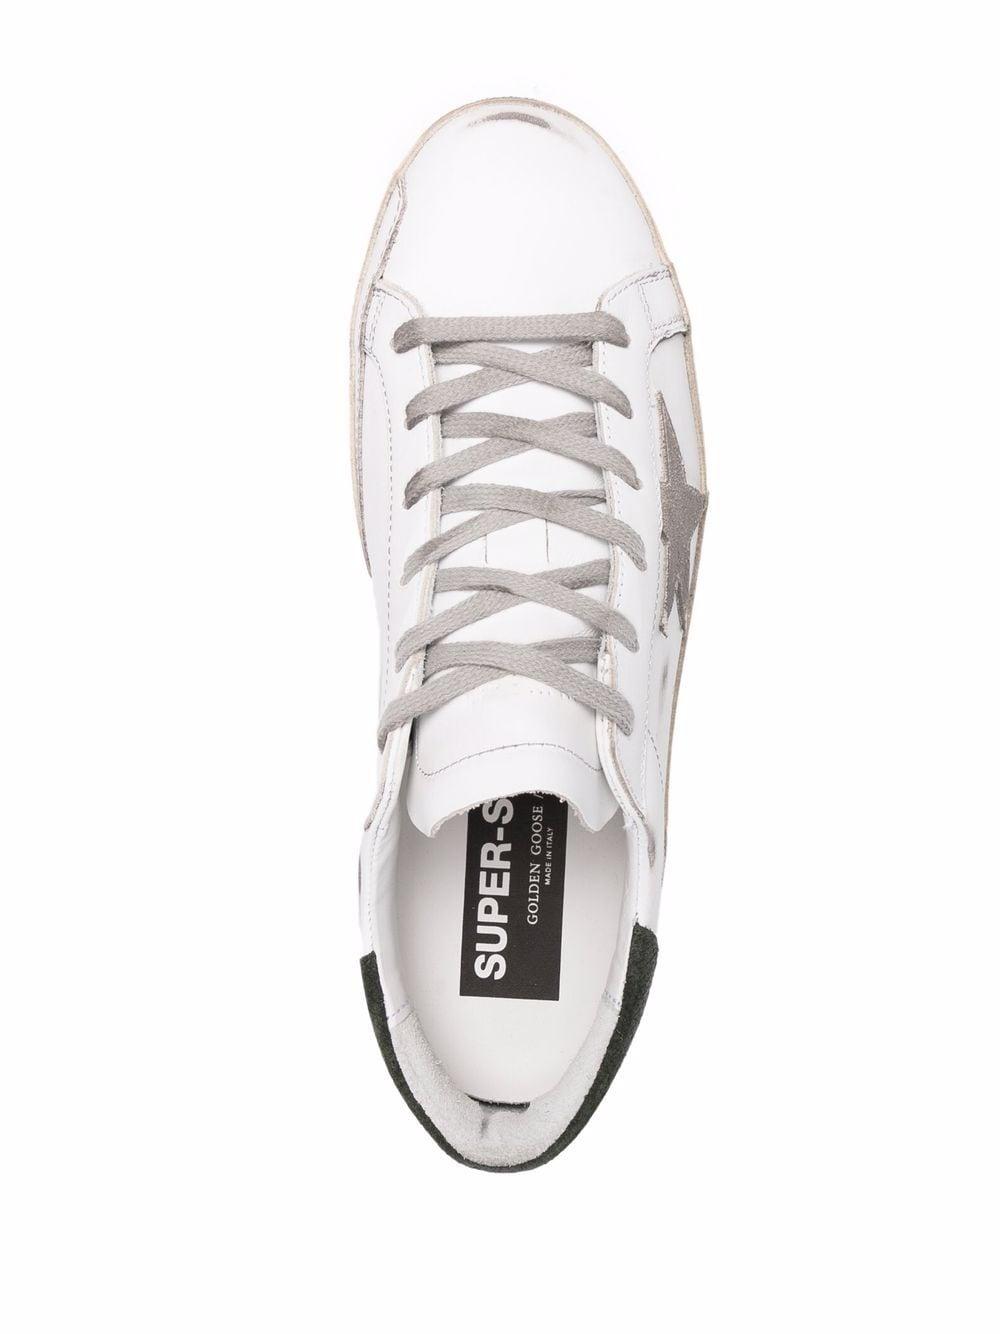 Picture of Golden Goose Deluxe Brand | Super-Star Low-Top Sneakers